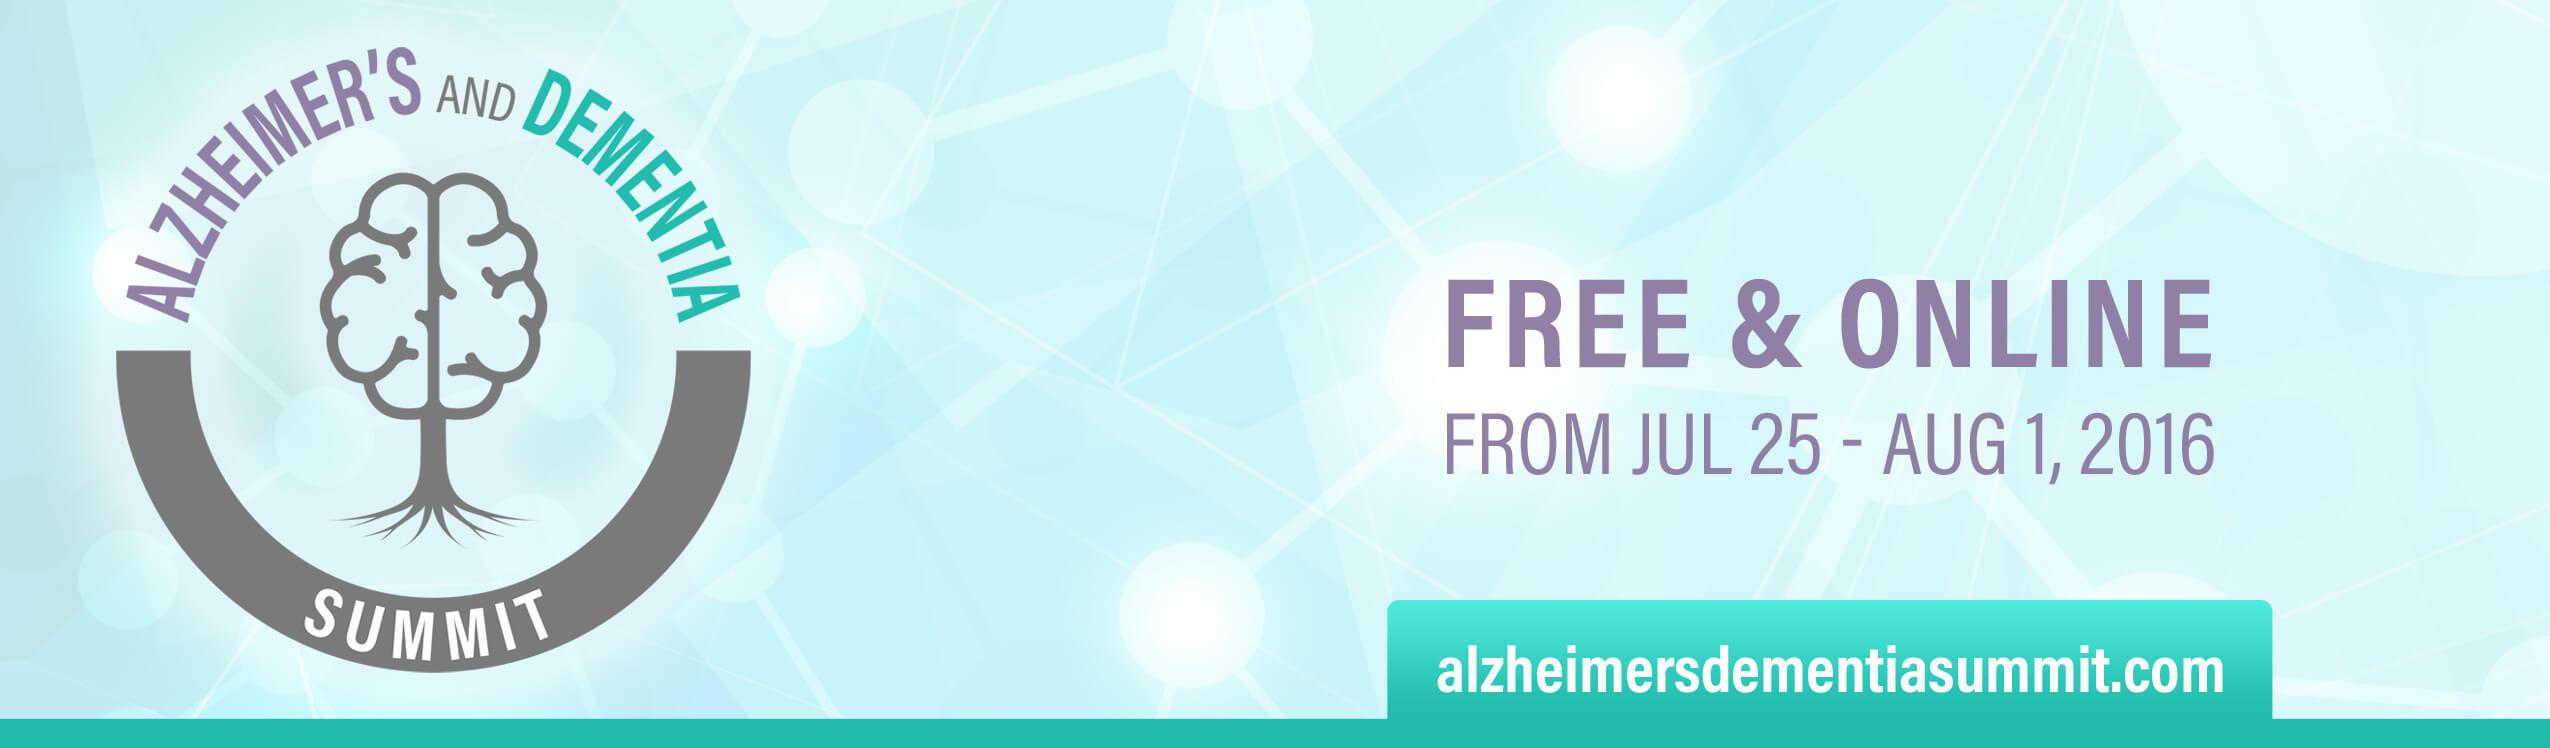 ALZ16_email-header